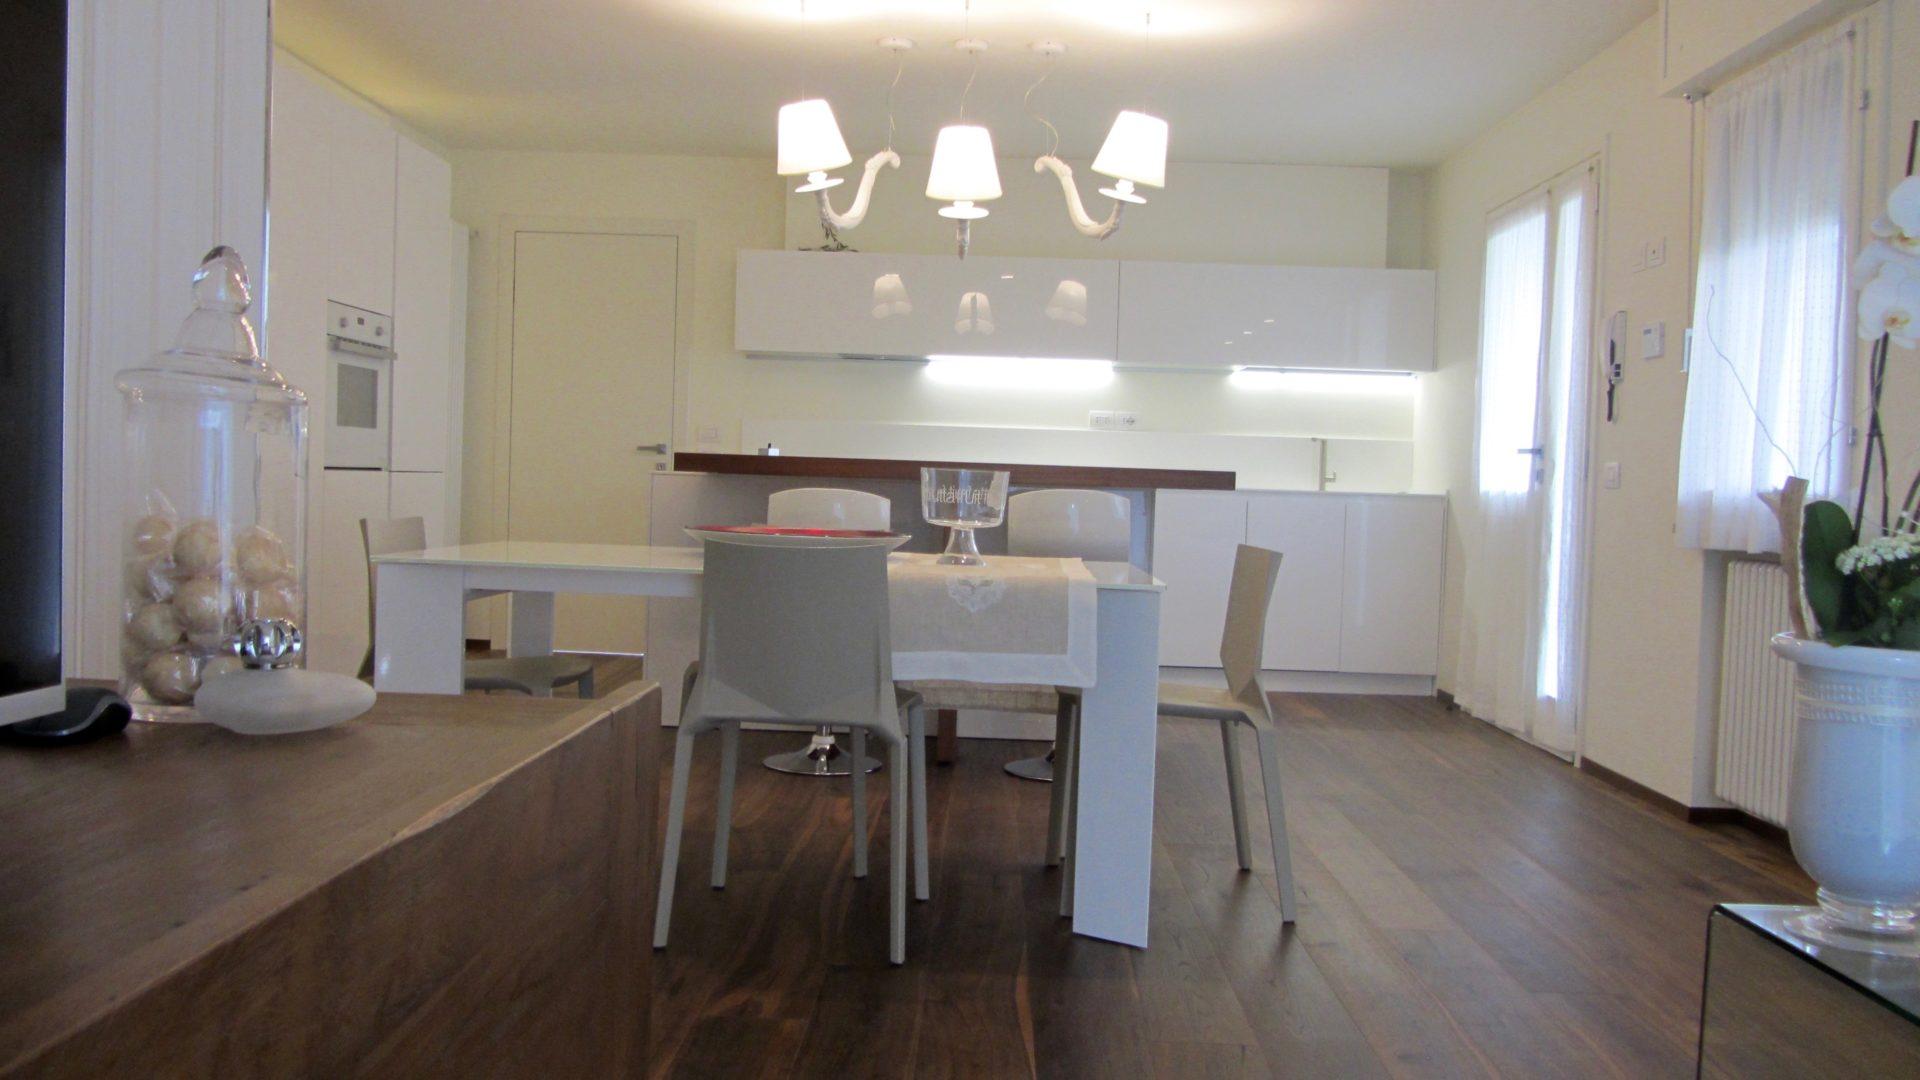 total-white-cucina-tavolo-lampade-tende-snack-madia-teak-abitazione ...